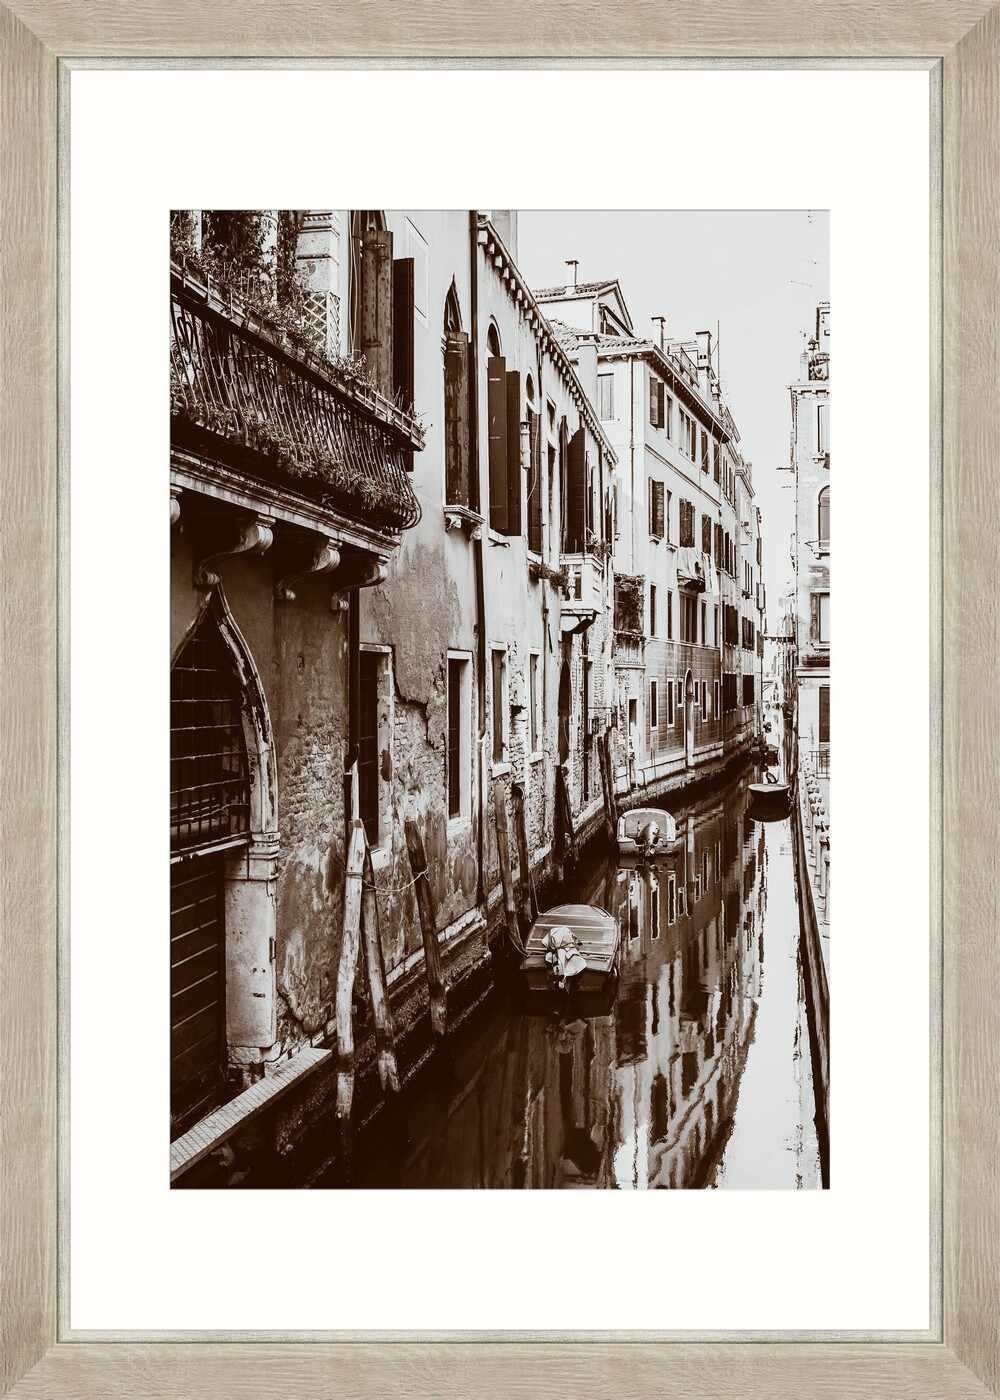 Tablou Framed Art Venician Canal I  la pret 534 lei